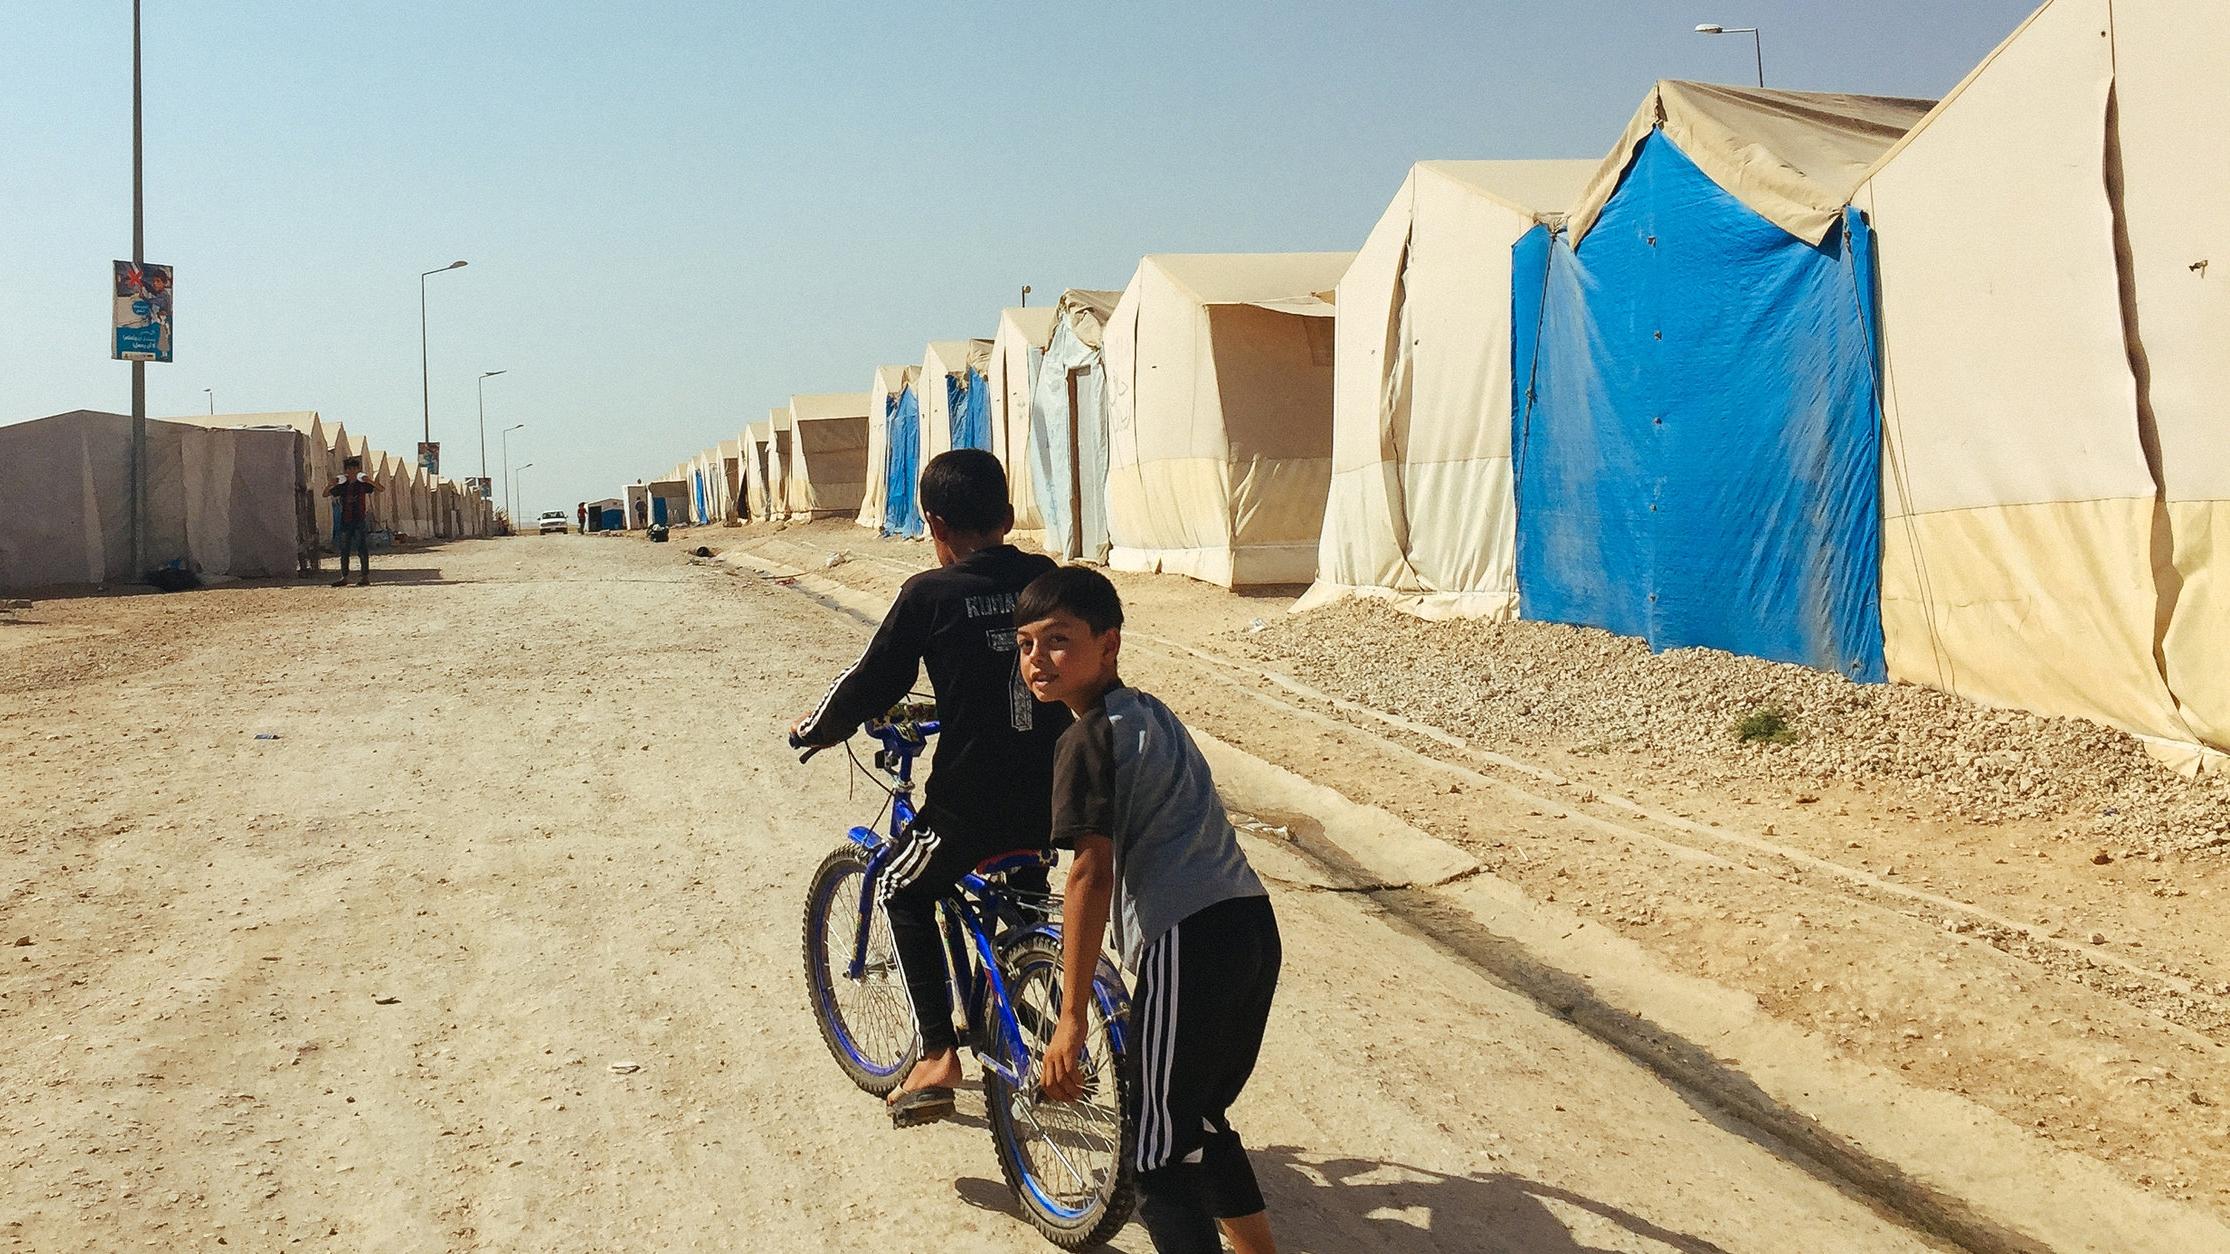 SyrianRefugeeCamp_Iraq.jpg